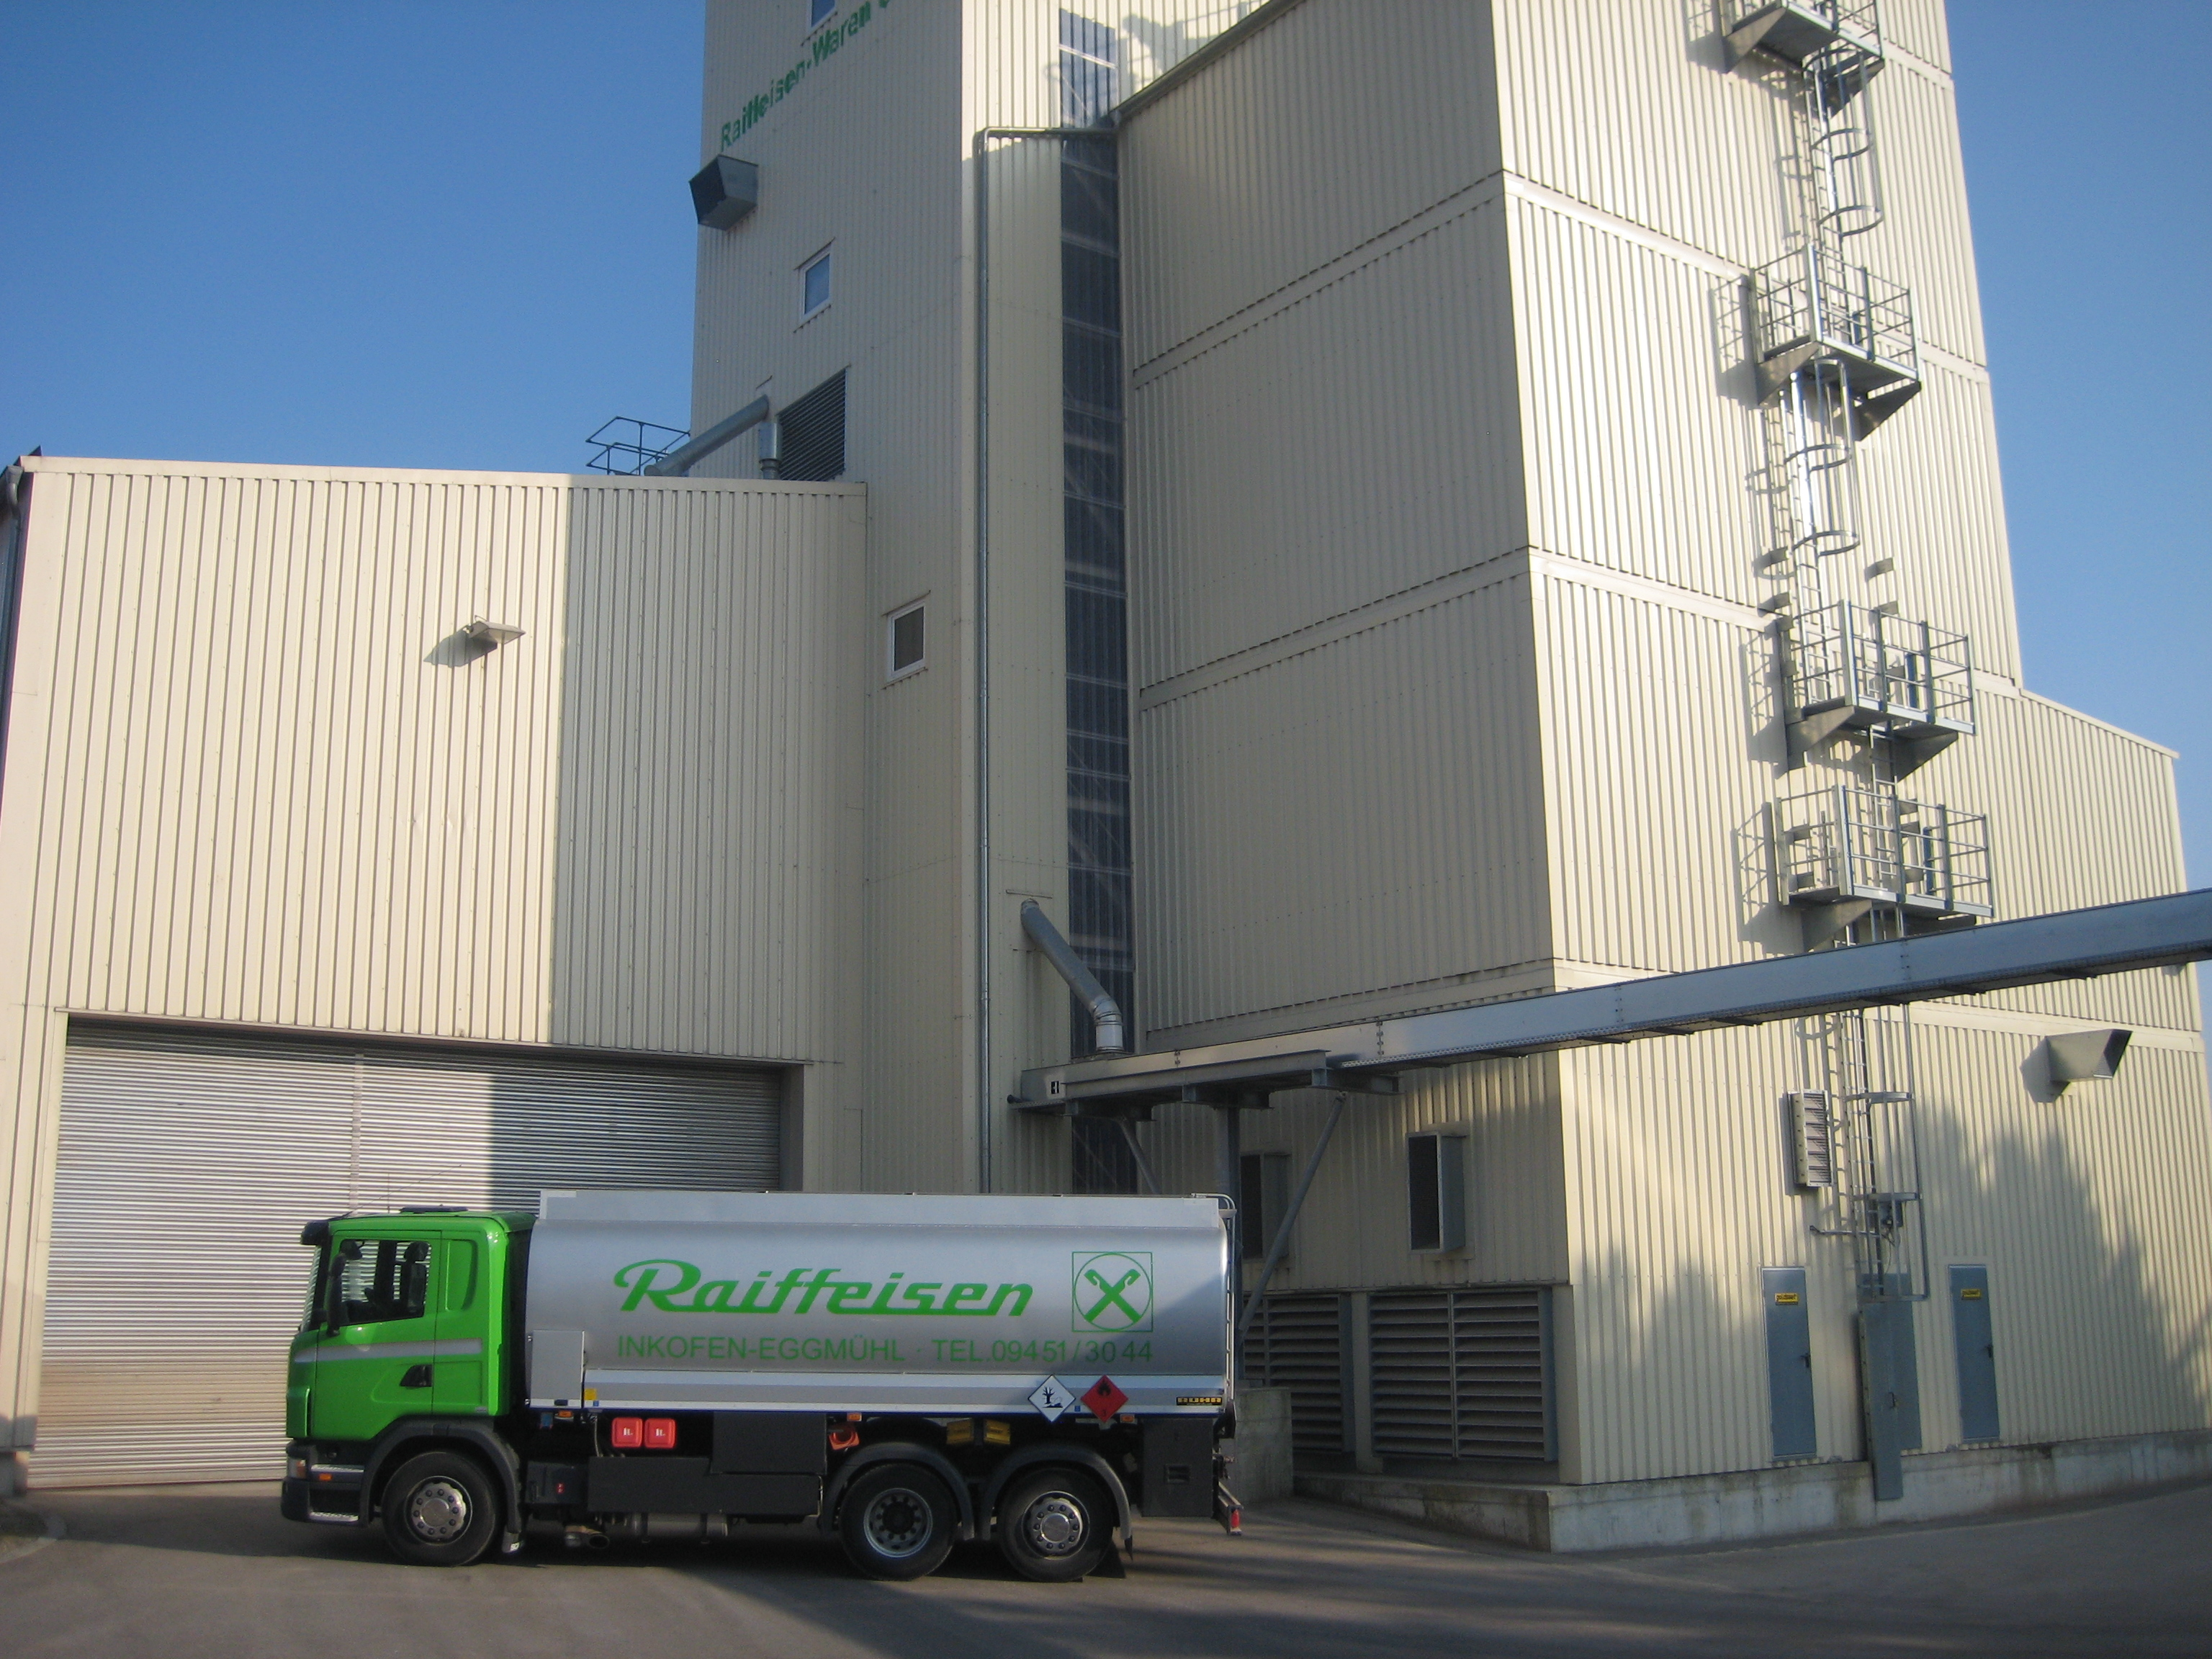 Raiffeisen-Waren GmbH Inkofen-Eggmühl